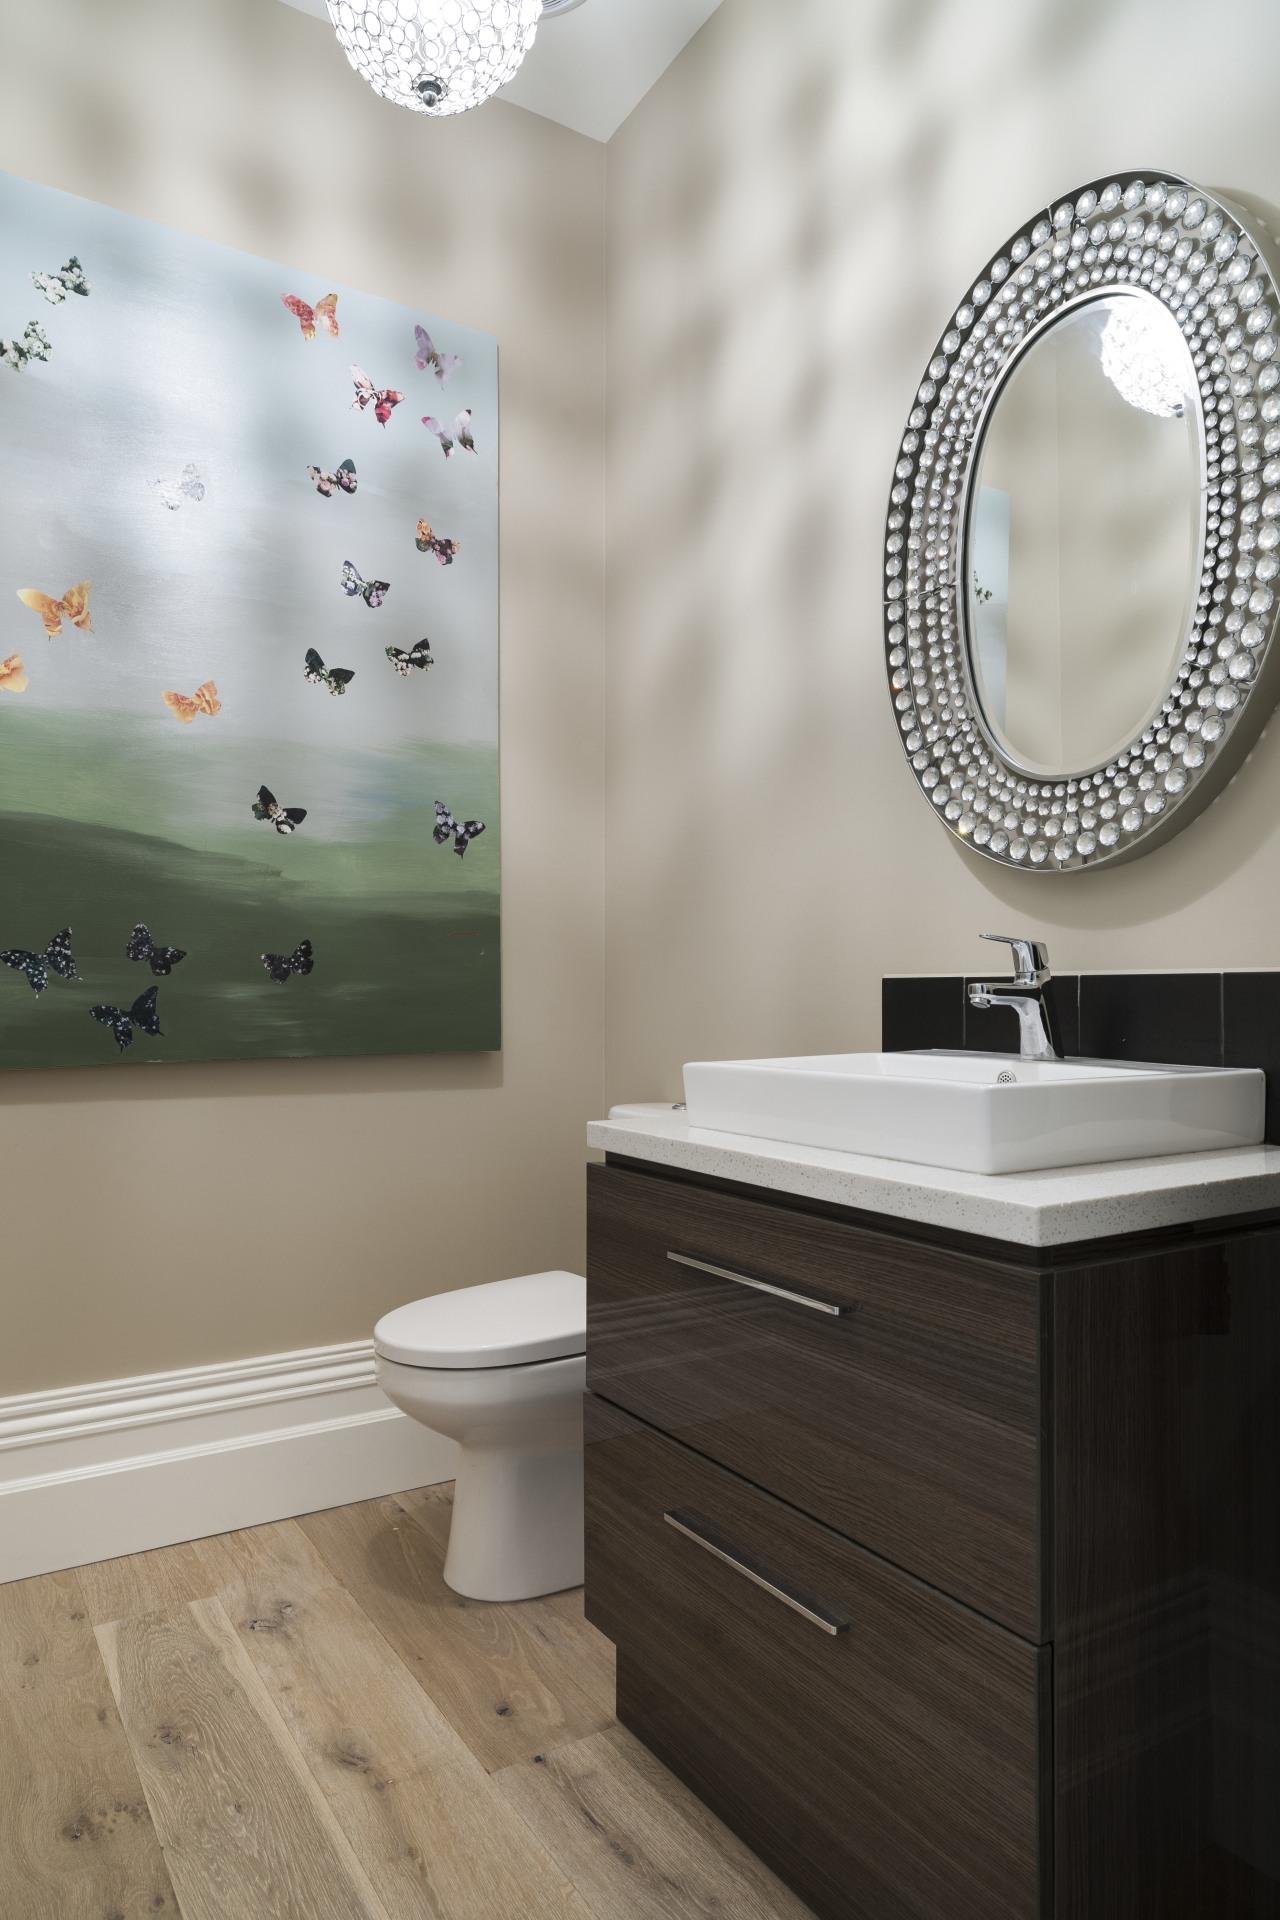 Neutral walls and engineered timber flooring that feature bathroom, bathroom accessory, bathroom cabinet, bathroom sink, ceramic, floor, interior design, plumbing fixture, product, product design, room, sink, tap, tile, wall, gray